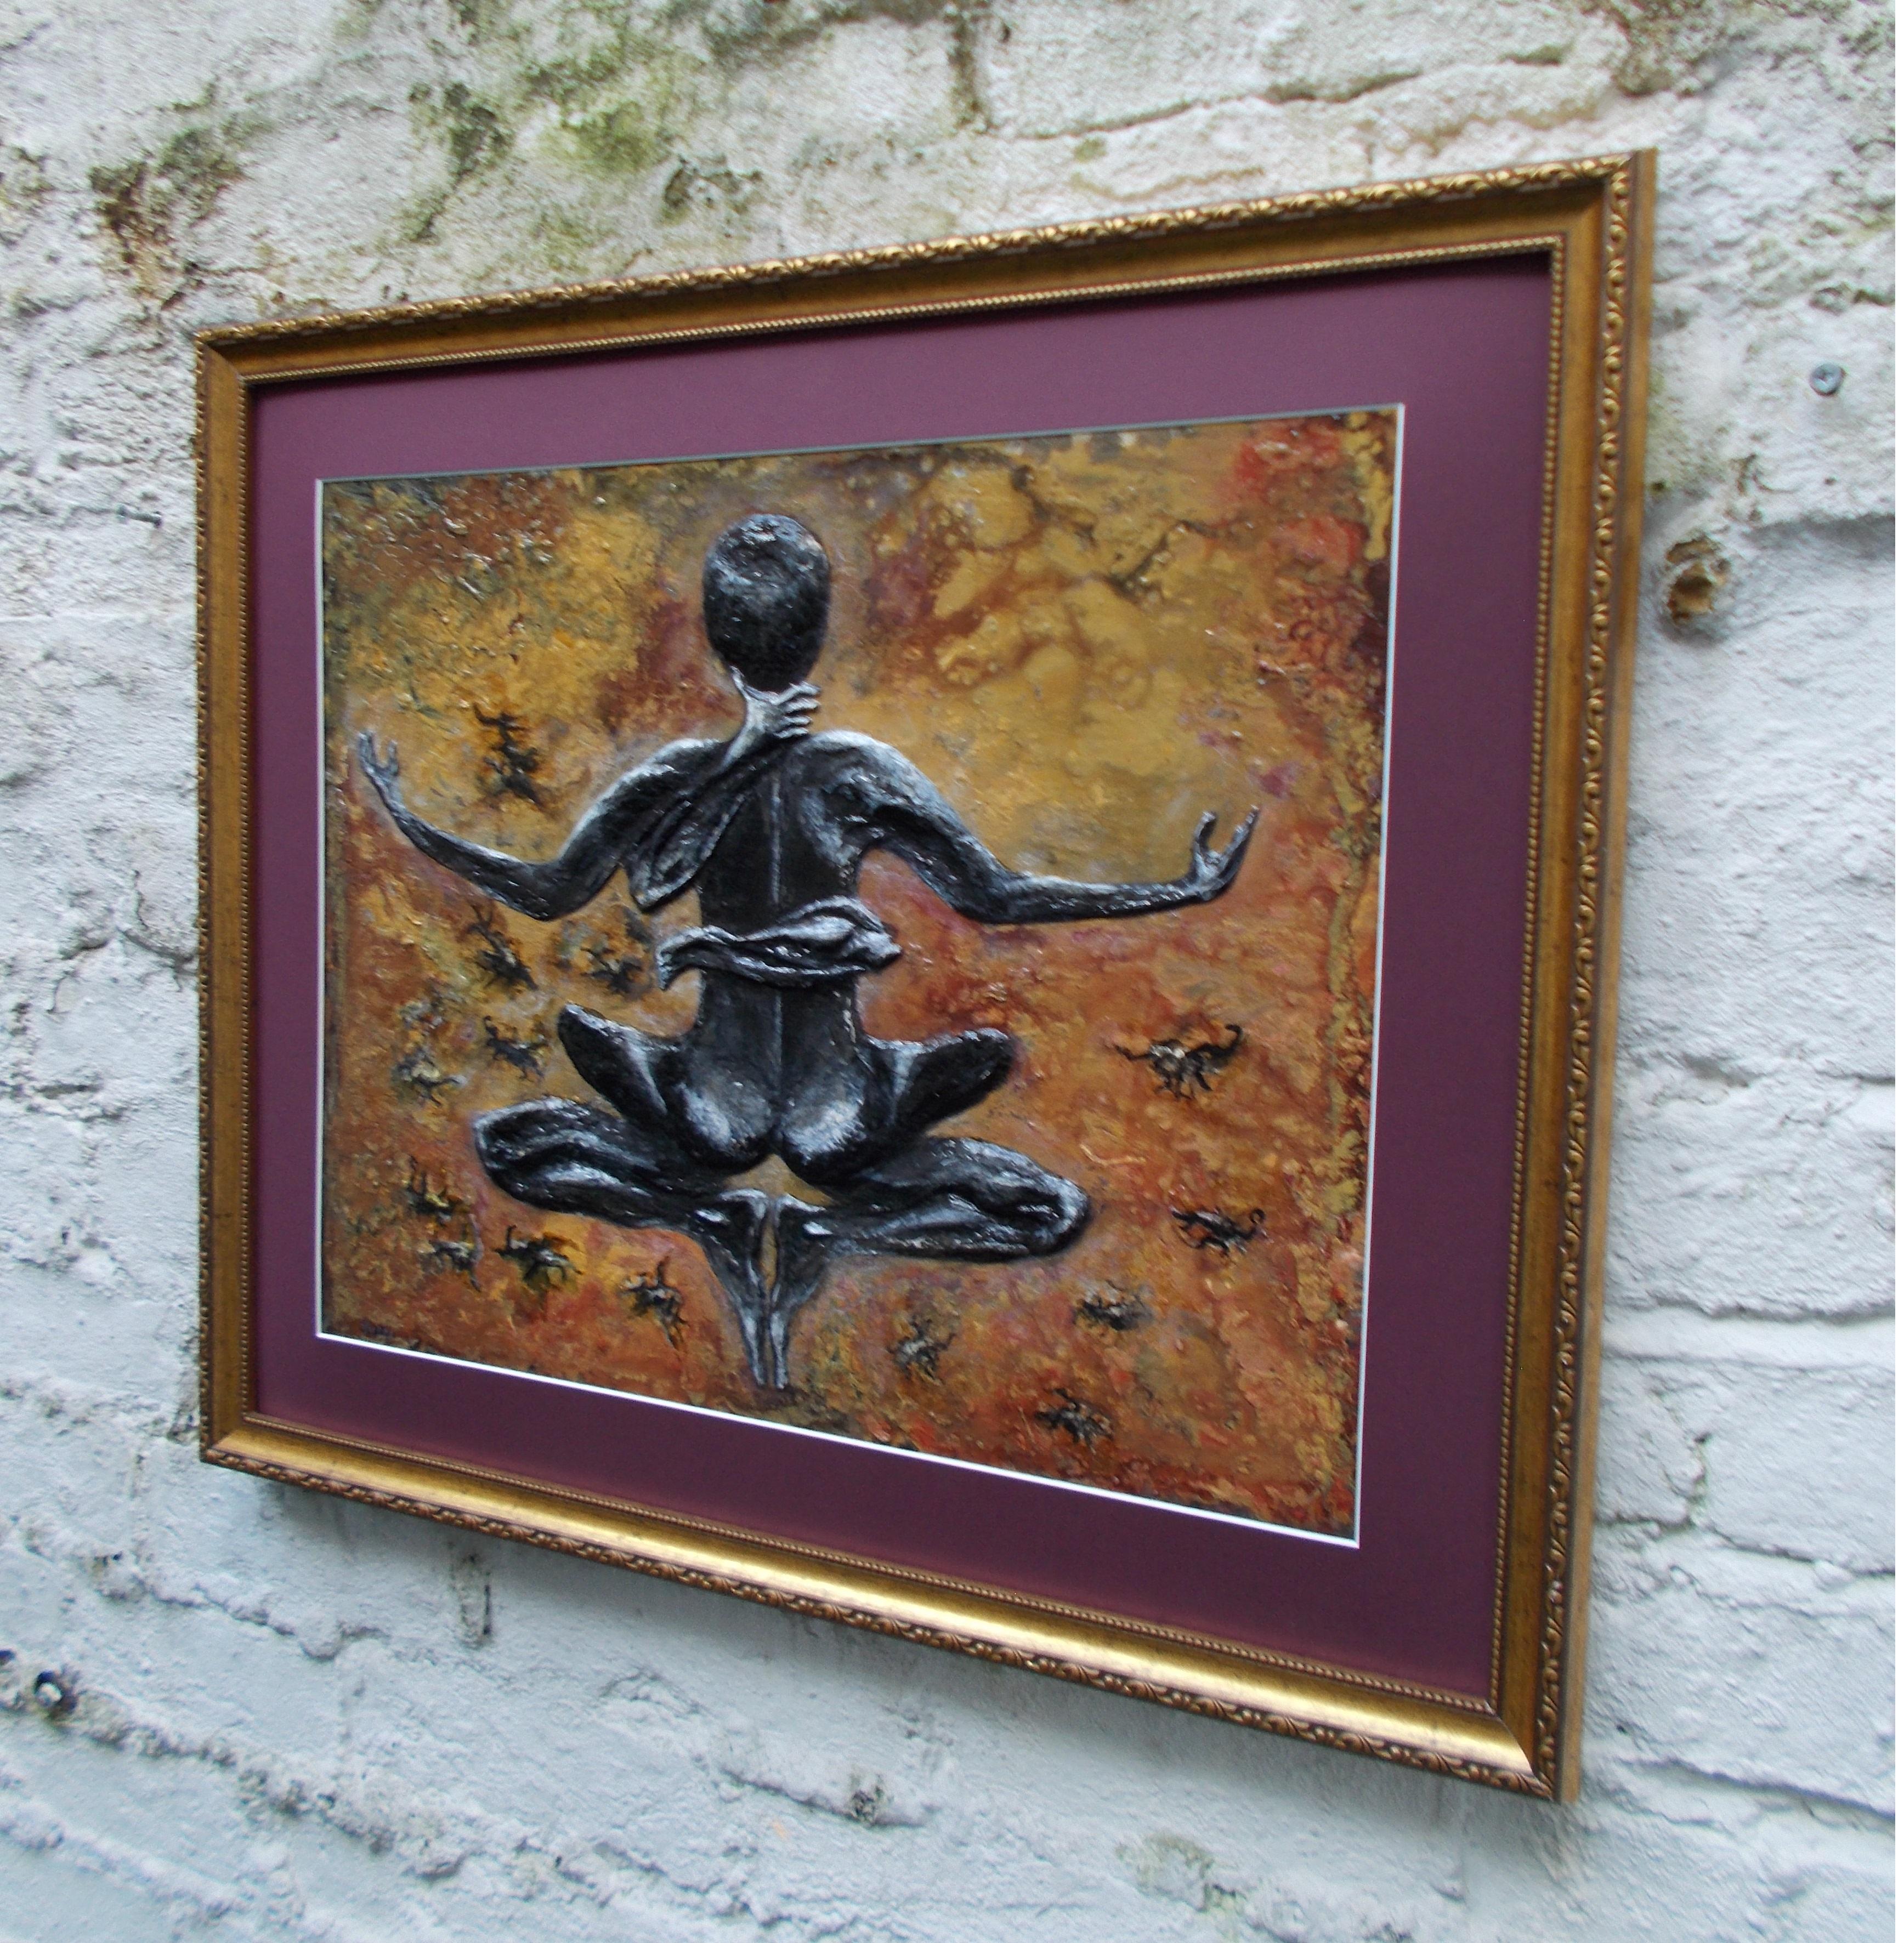 Scorpio-The-Scorpion-Oct 23-Nov 21-Jurita-2019-Painting Relief 3D-mixed-media-acrylic-clay-40x50cm© (10)